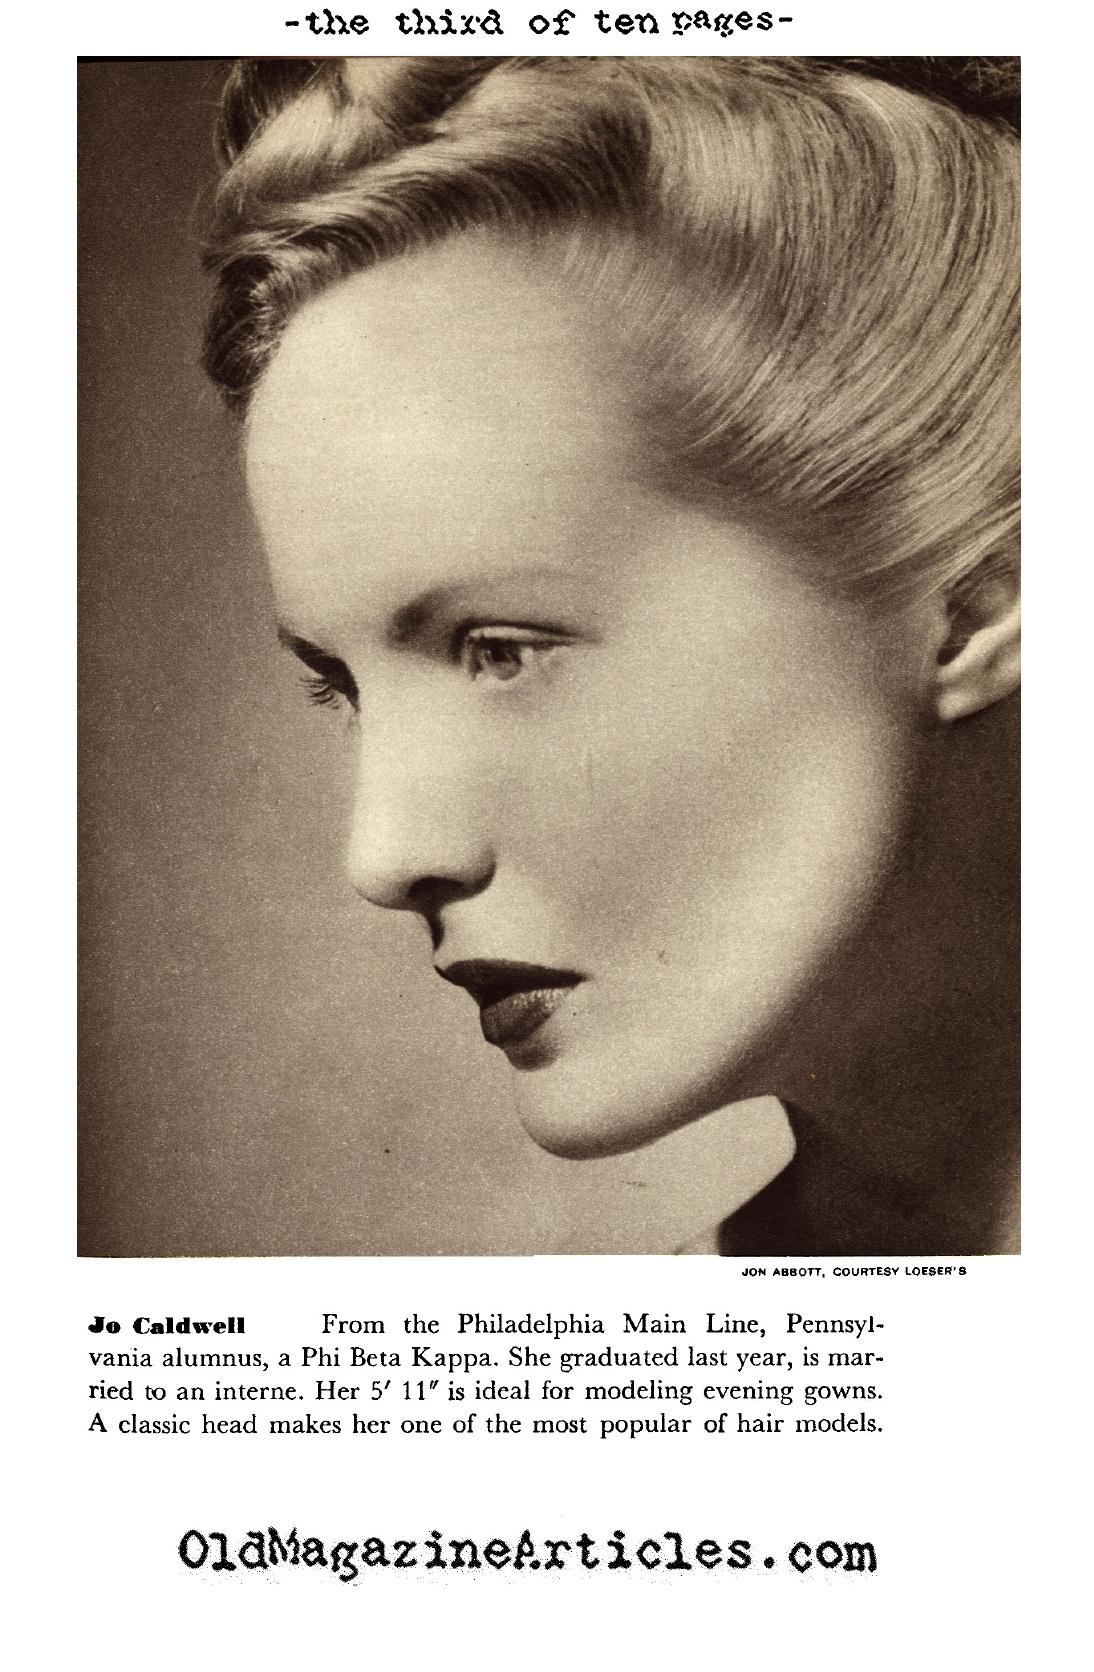 1940 s fashion for women